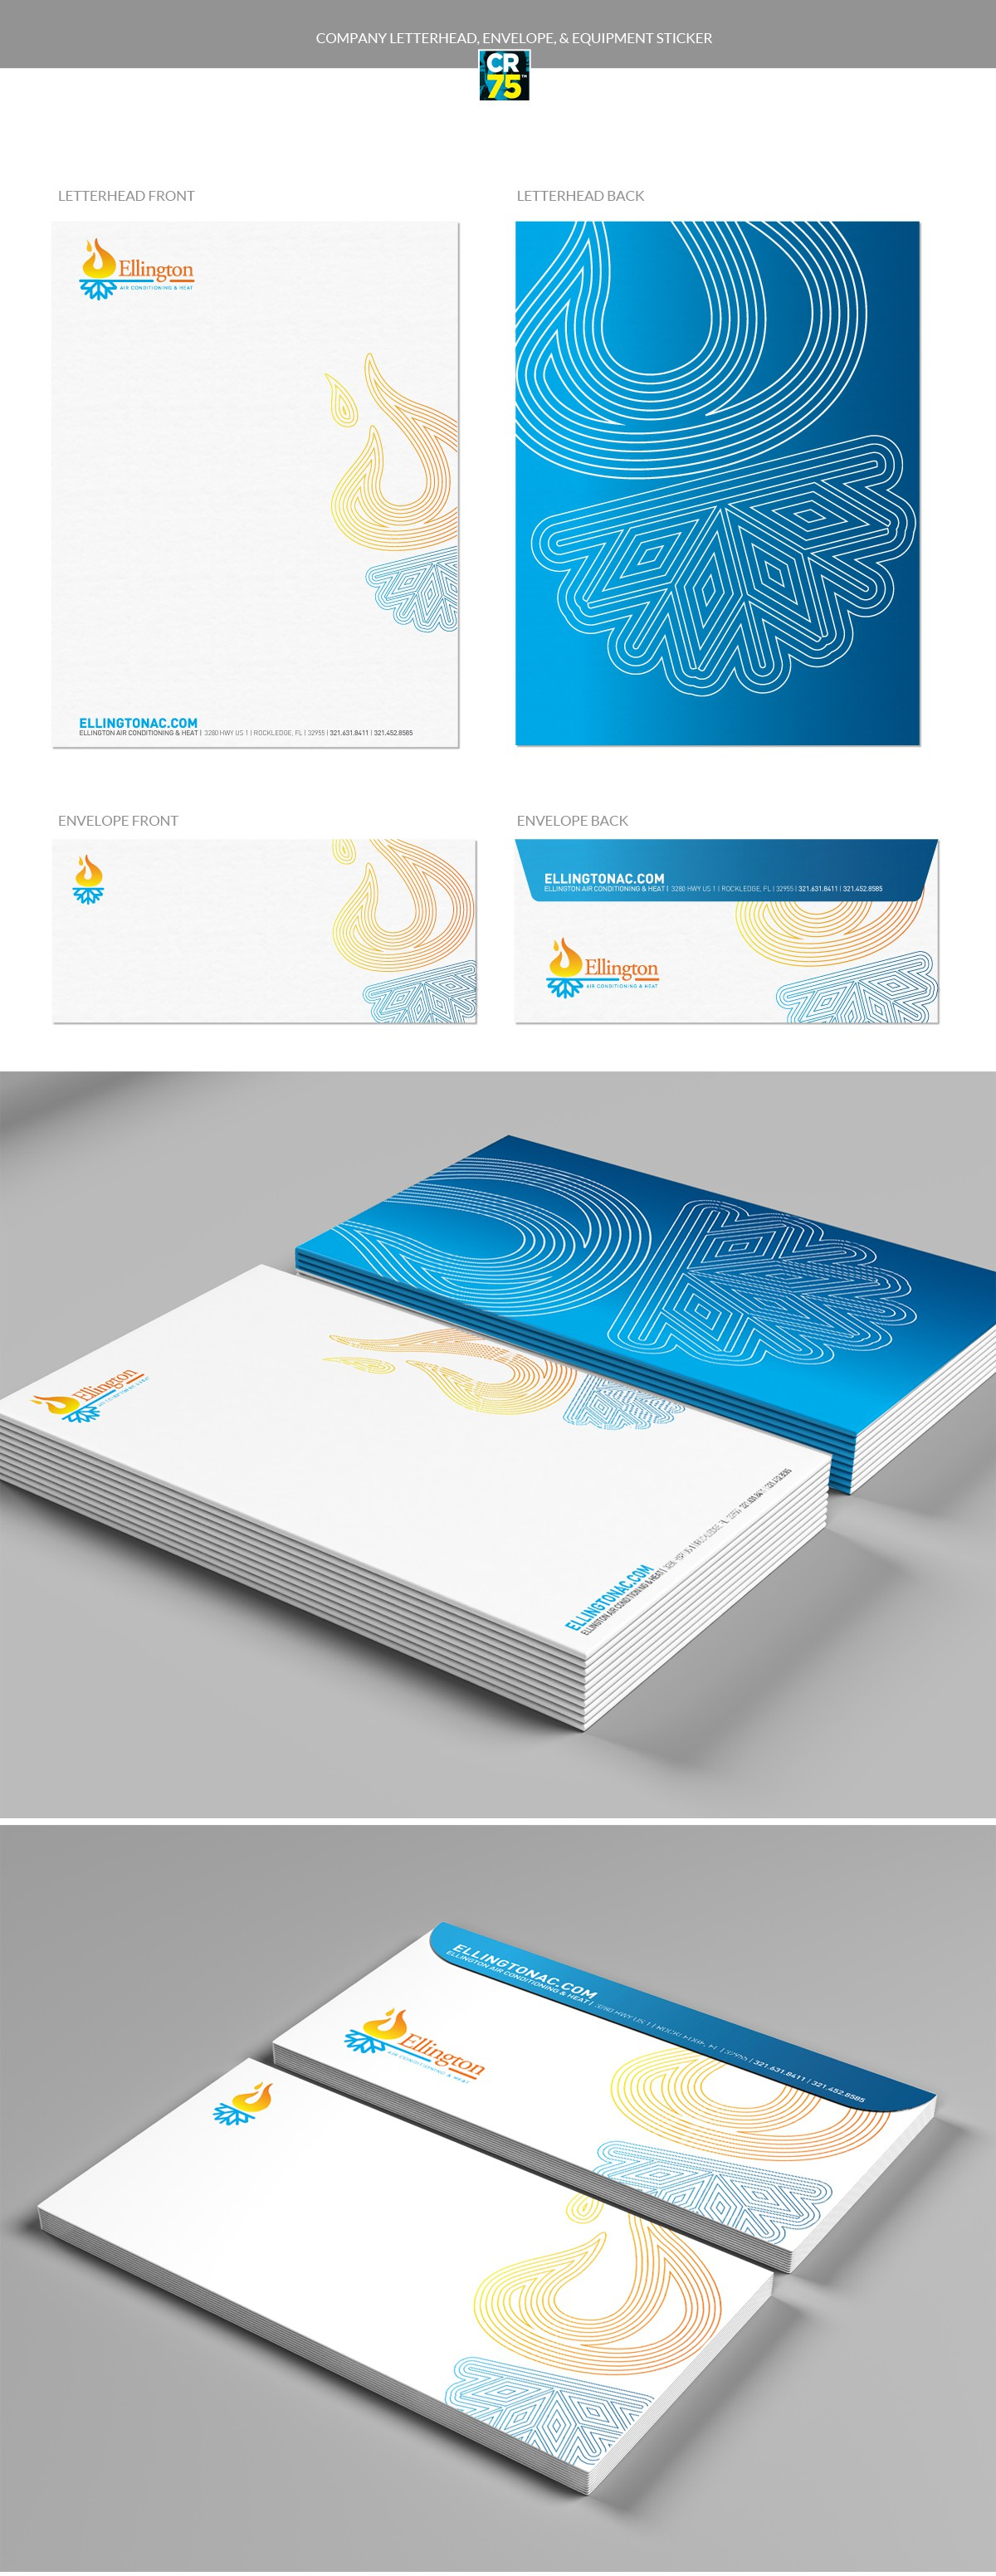 Company letterhead, envelope, & equipment sticker